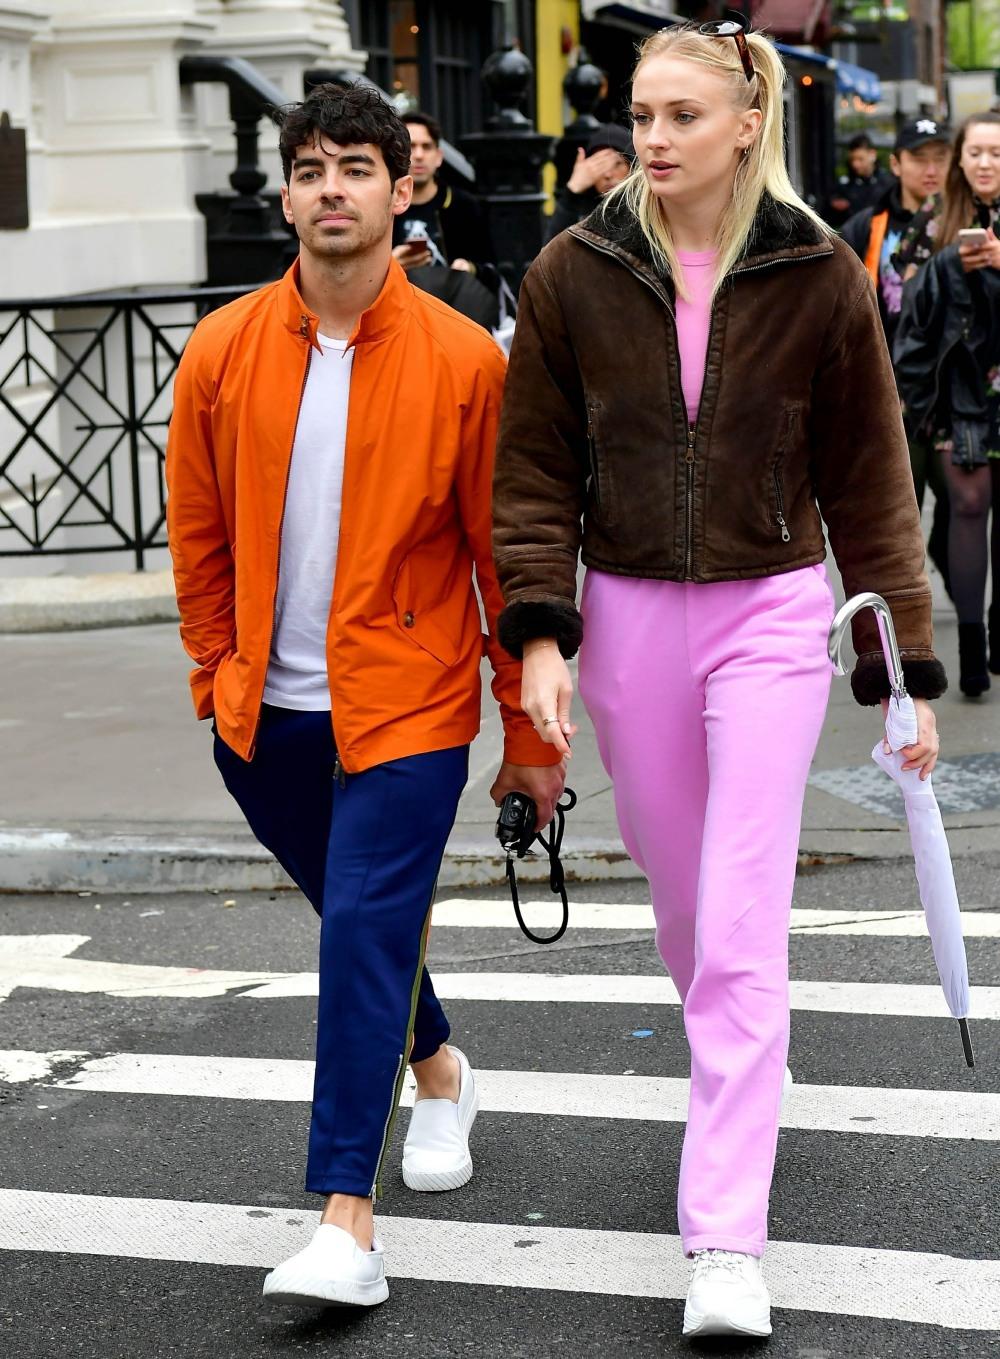 Joe Jonas e Sophie Turner sono visti per la prima volta dopo il loro matrimonio a sorpresa